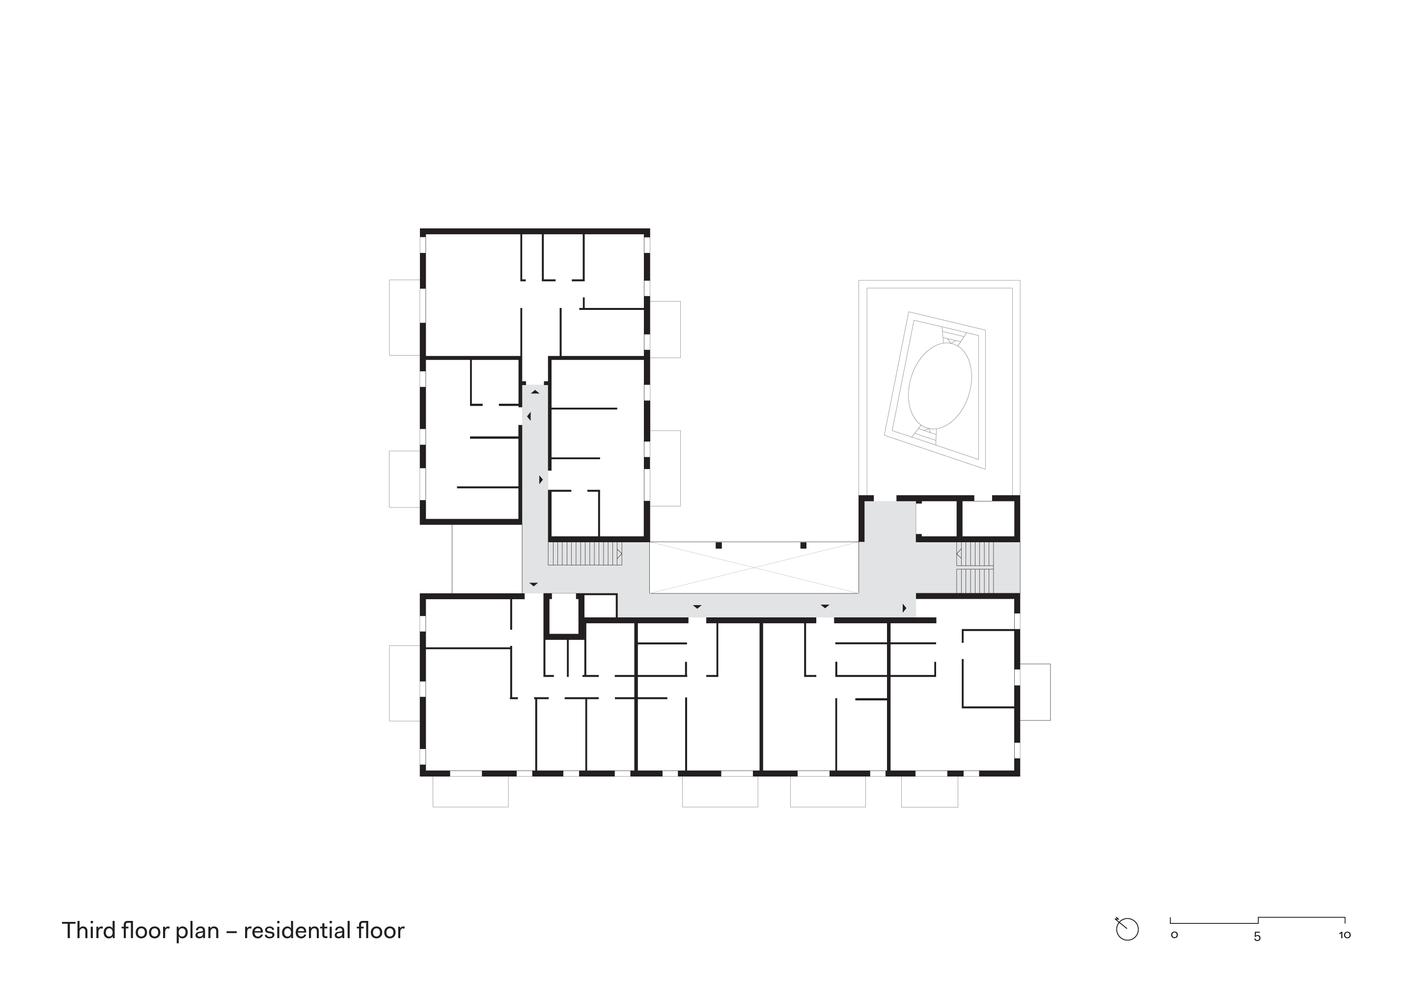 House by the Park / feld72 Architekten